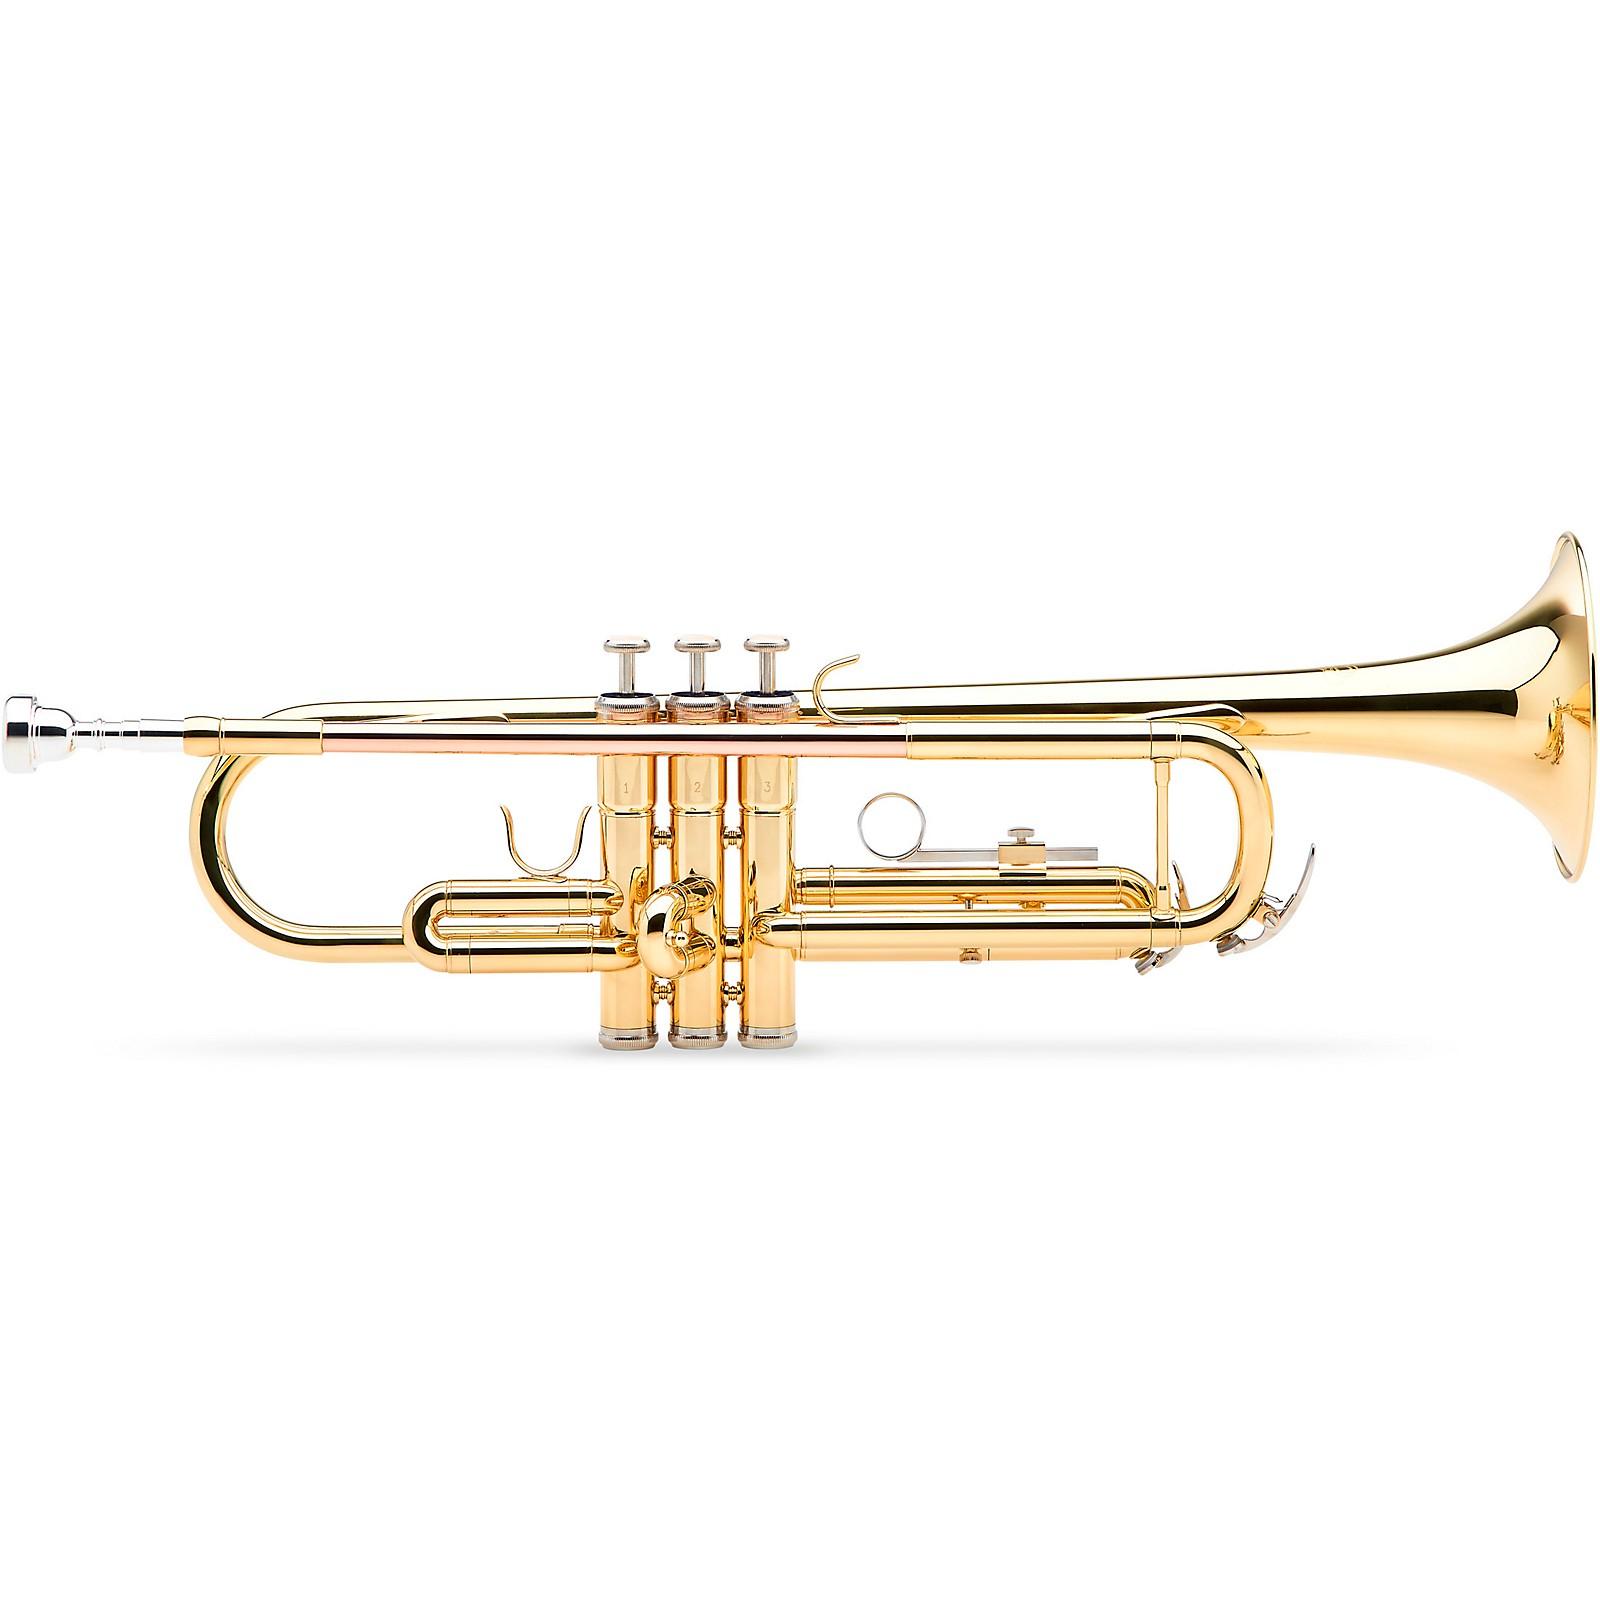 Etude ETR-100 Series Student Bb Trumpet